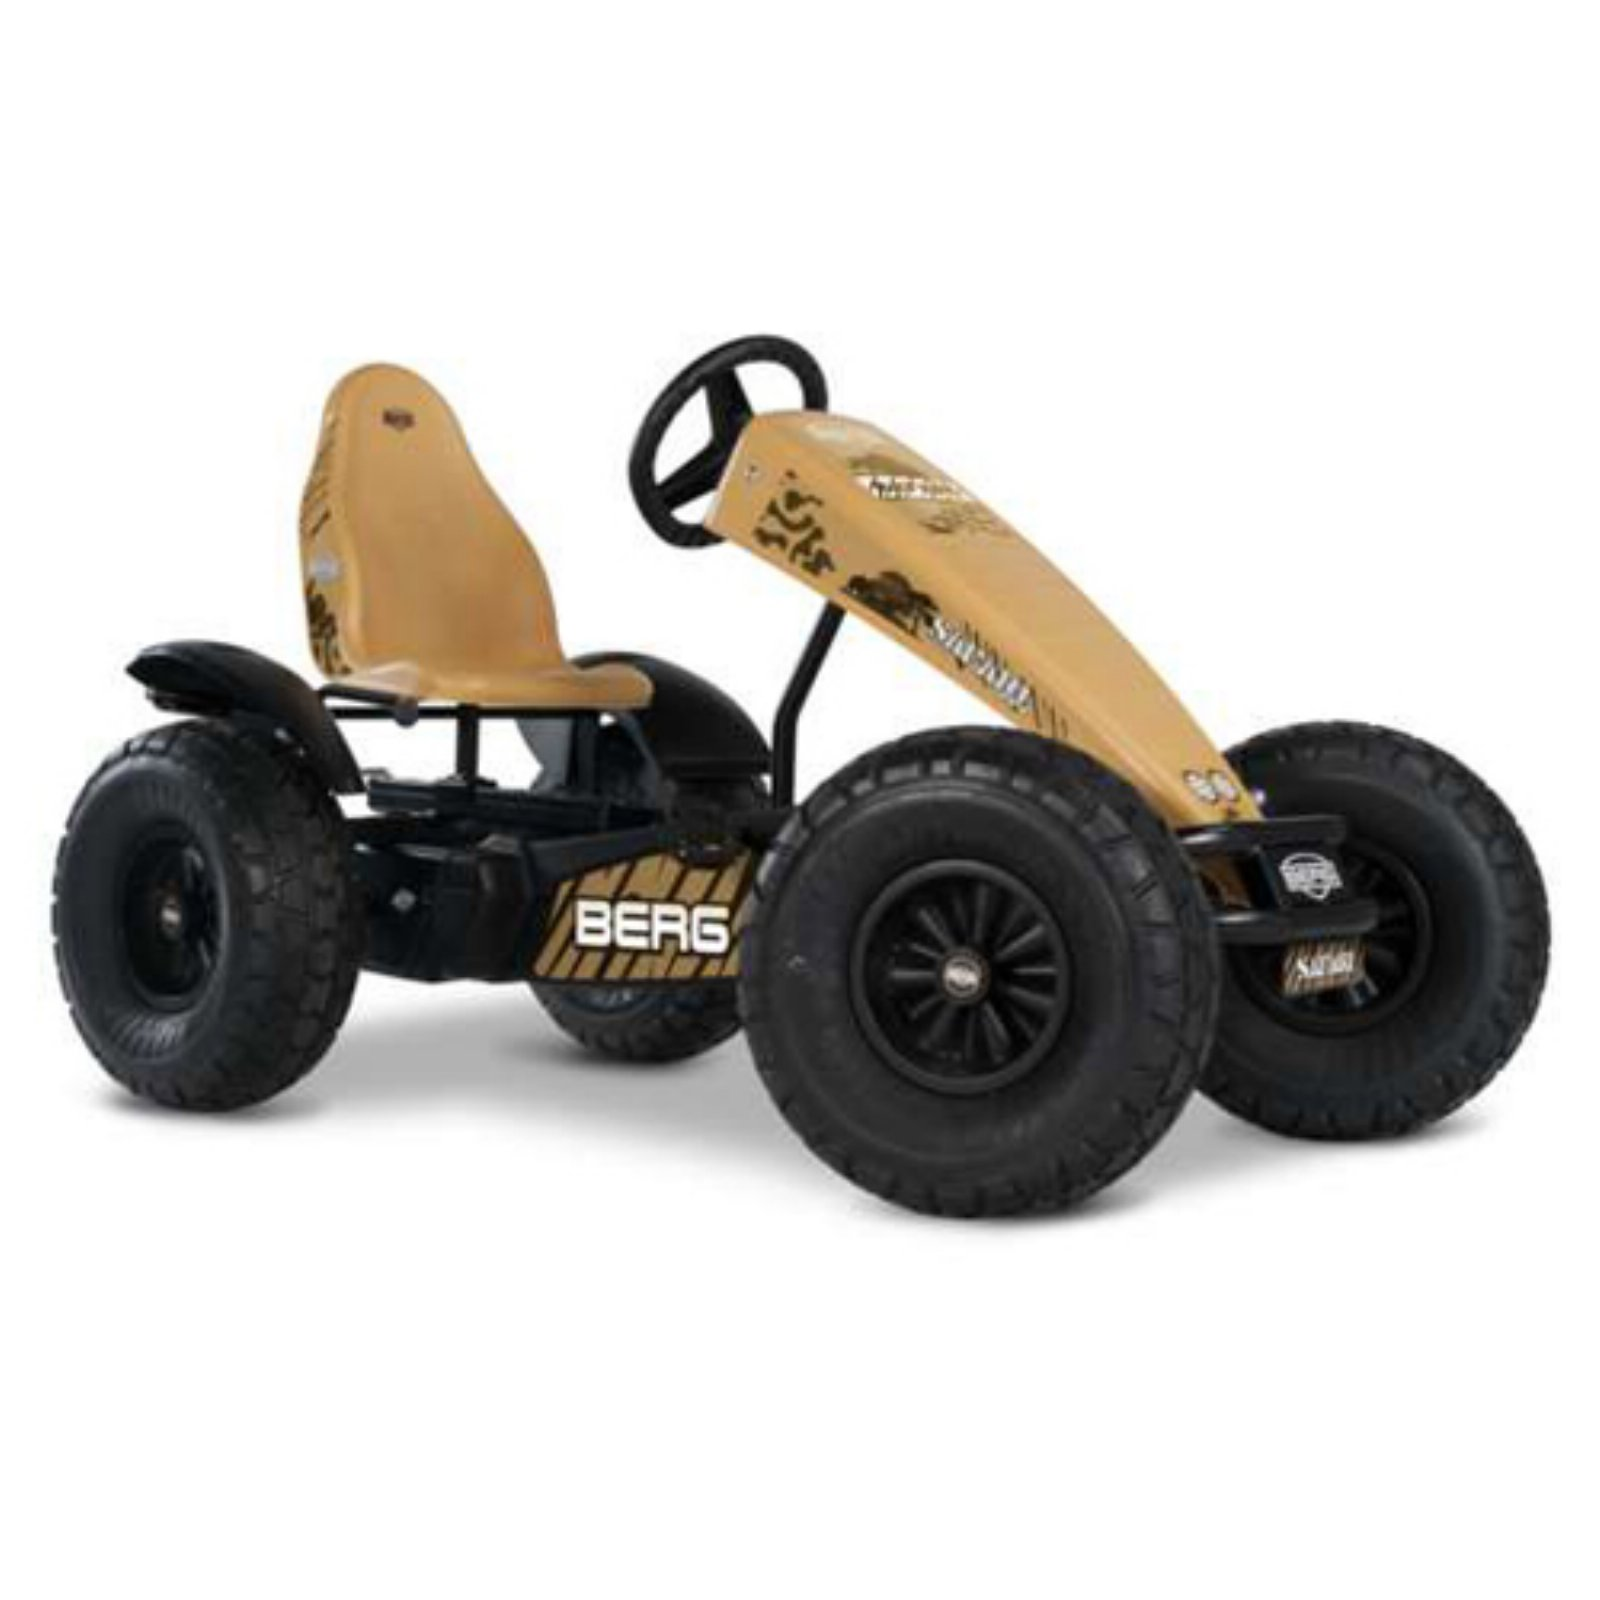 Berg USA Safari BFR 3 Pedal Go Kart Riding Toy by Berg USA